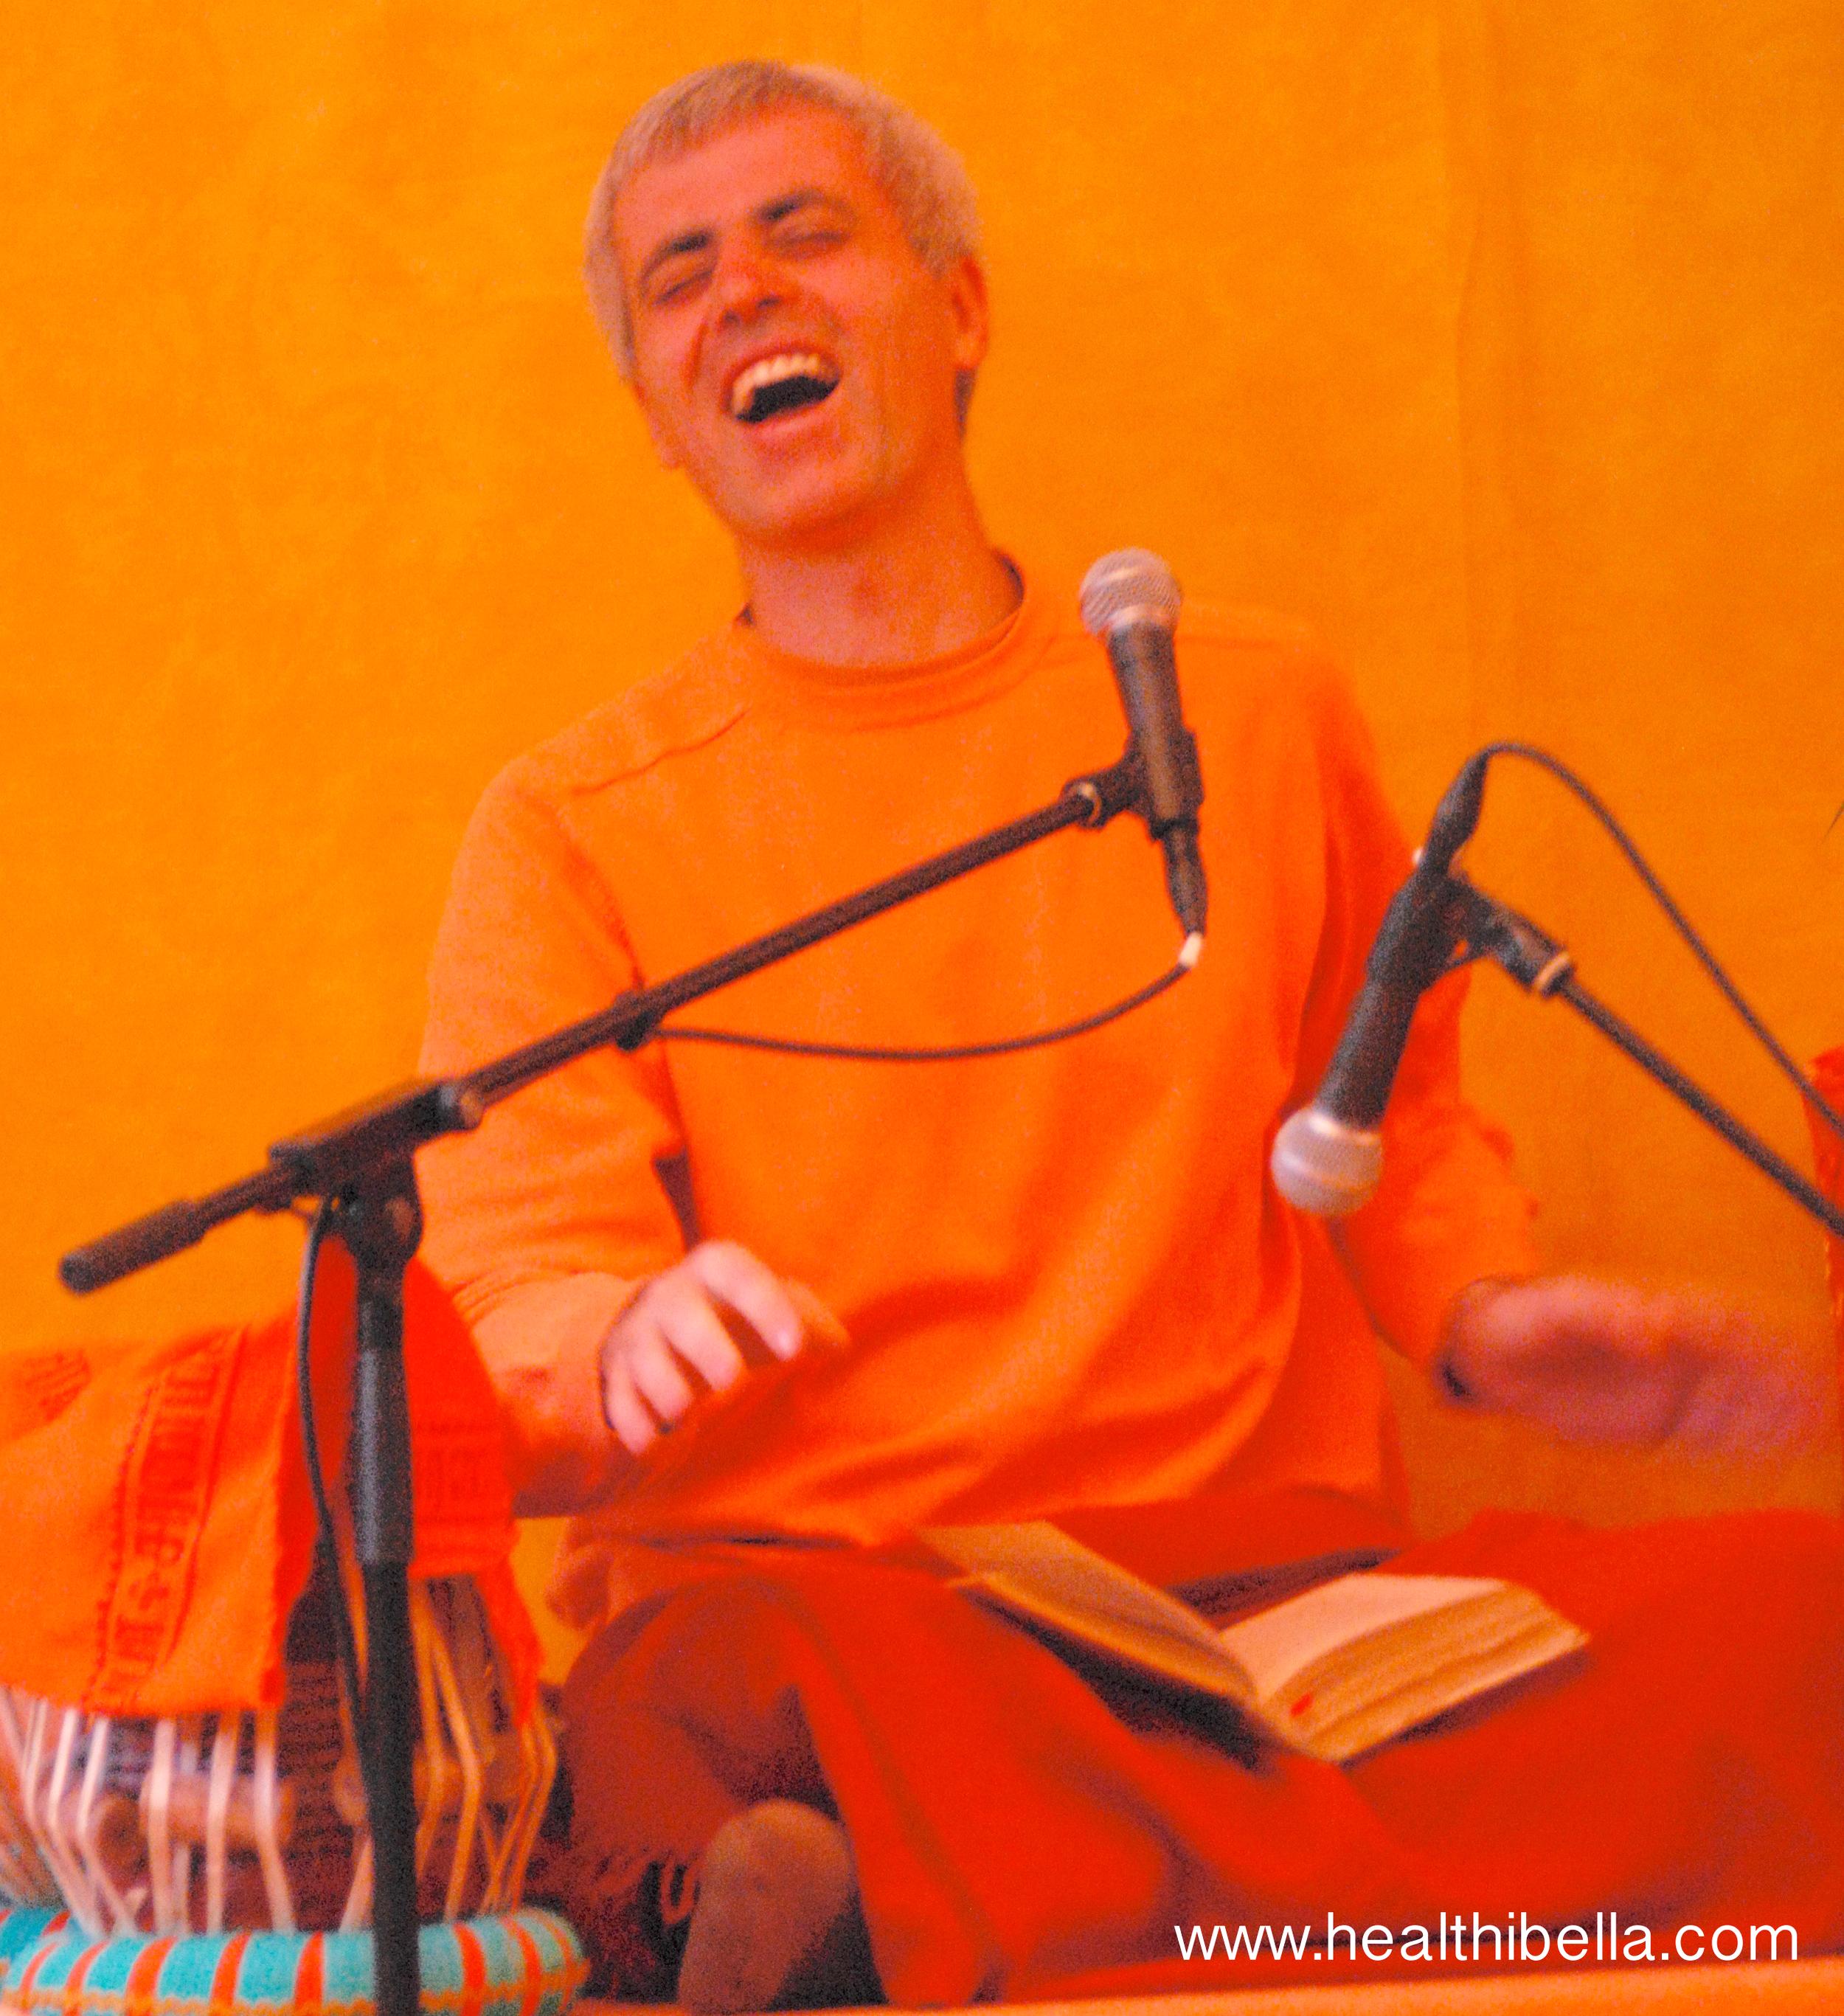 My master teacher Swami Sivadasananda shining bright with his booming laugh.